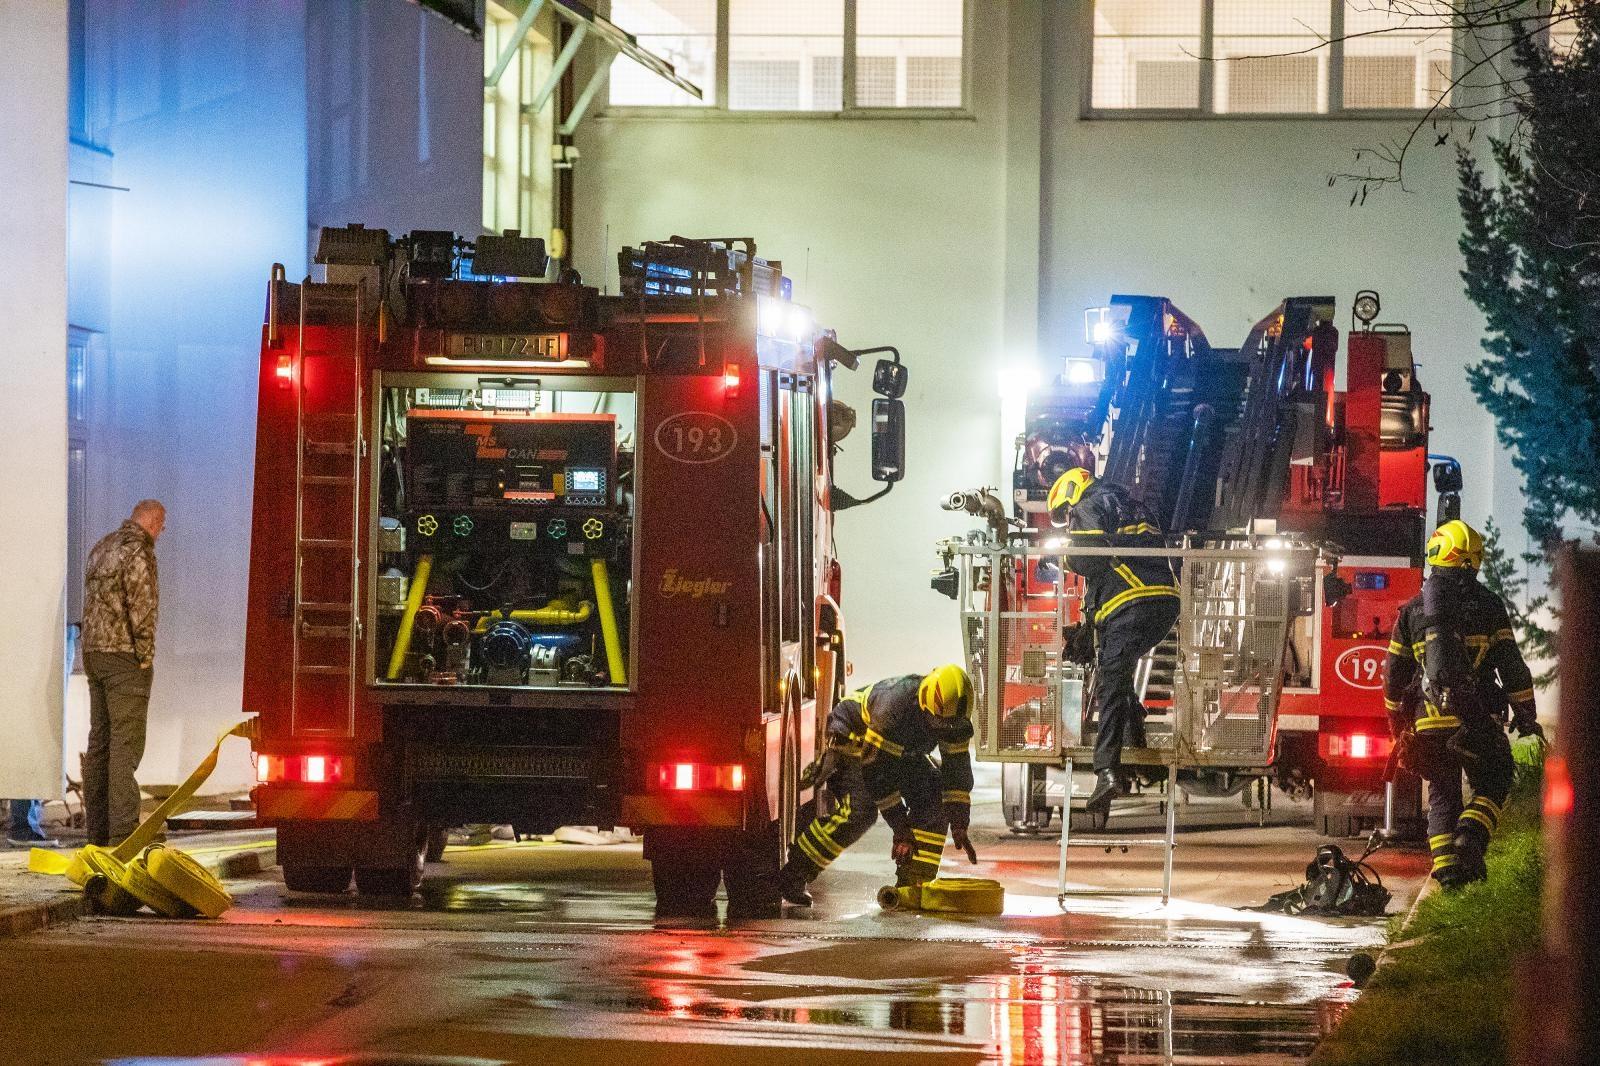 Čestitamo Dan vatrogasaca